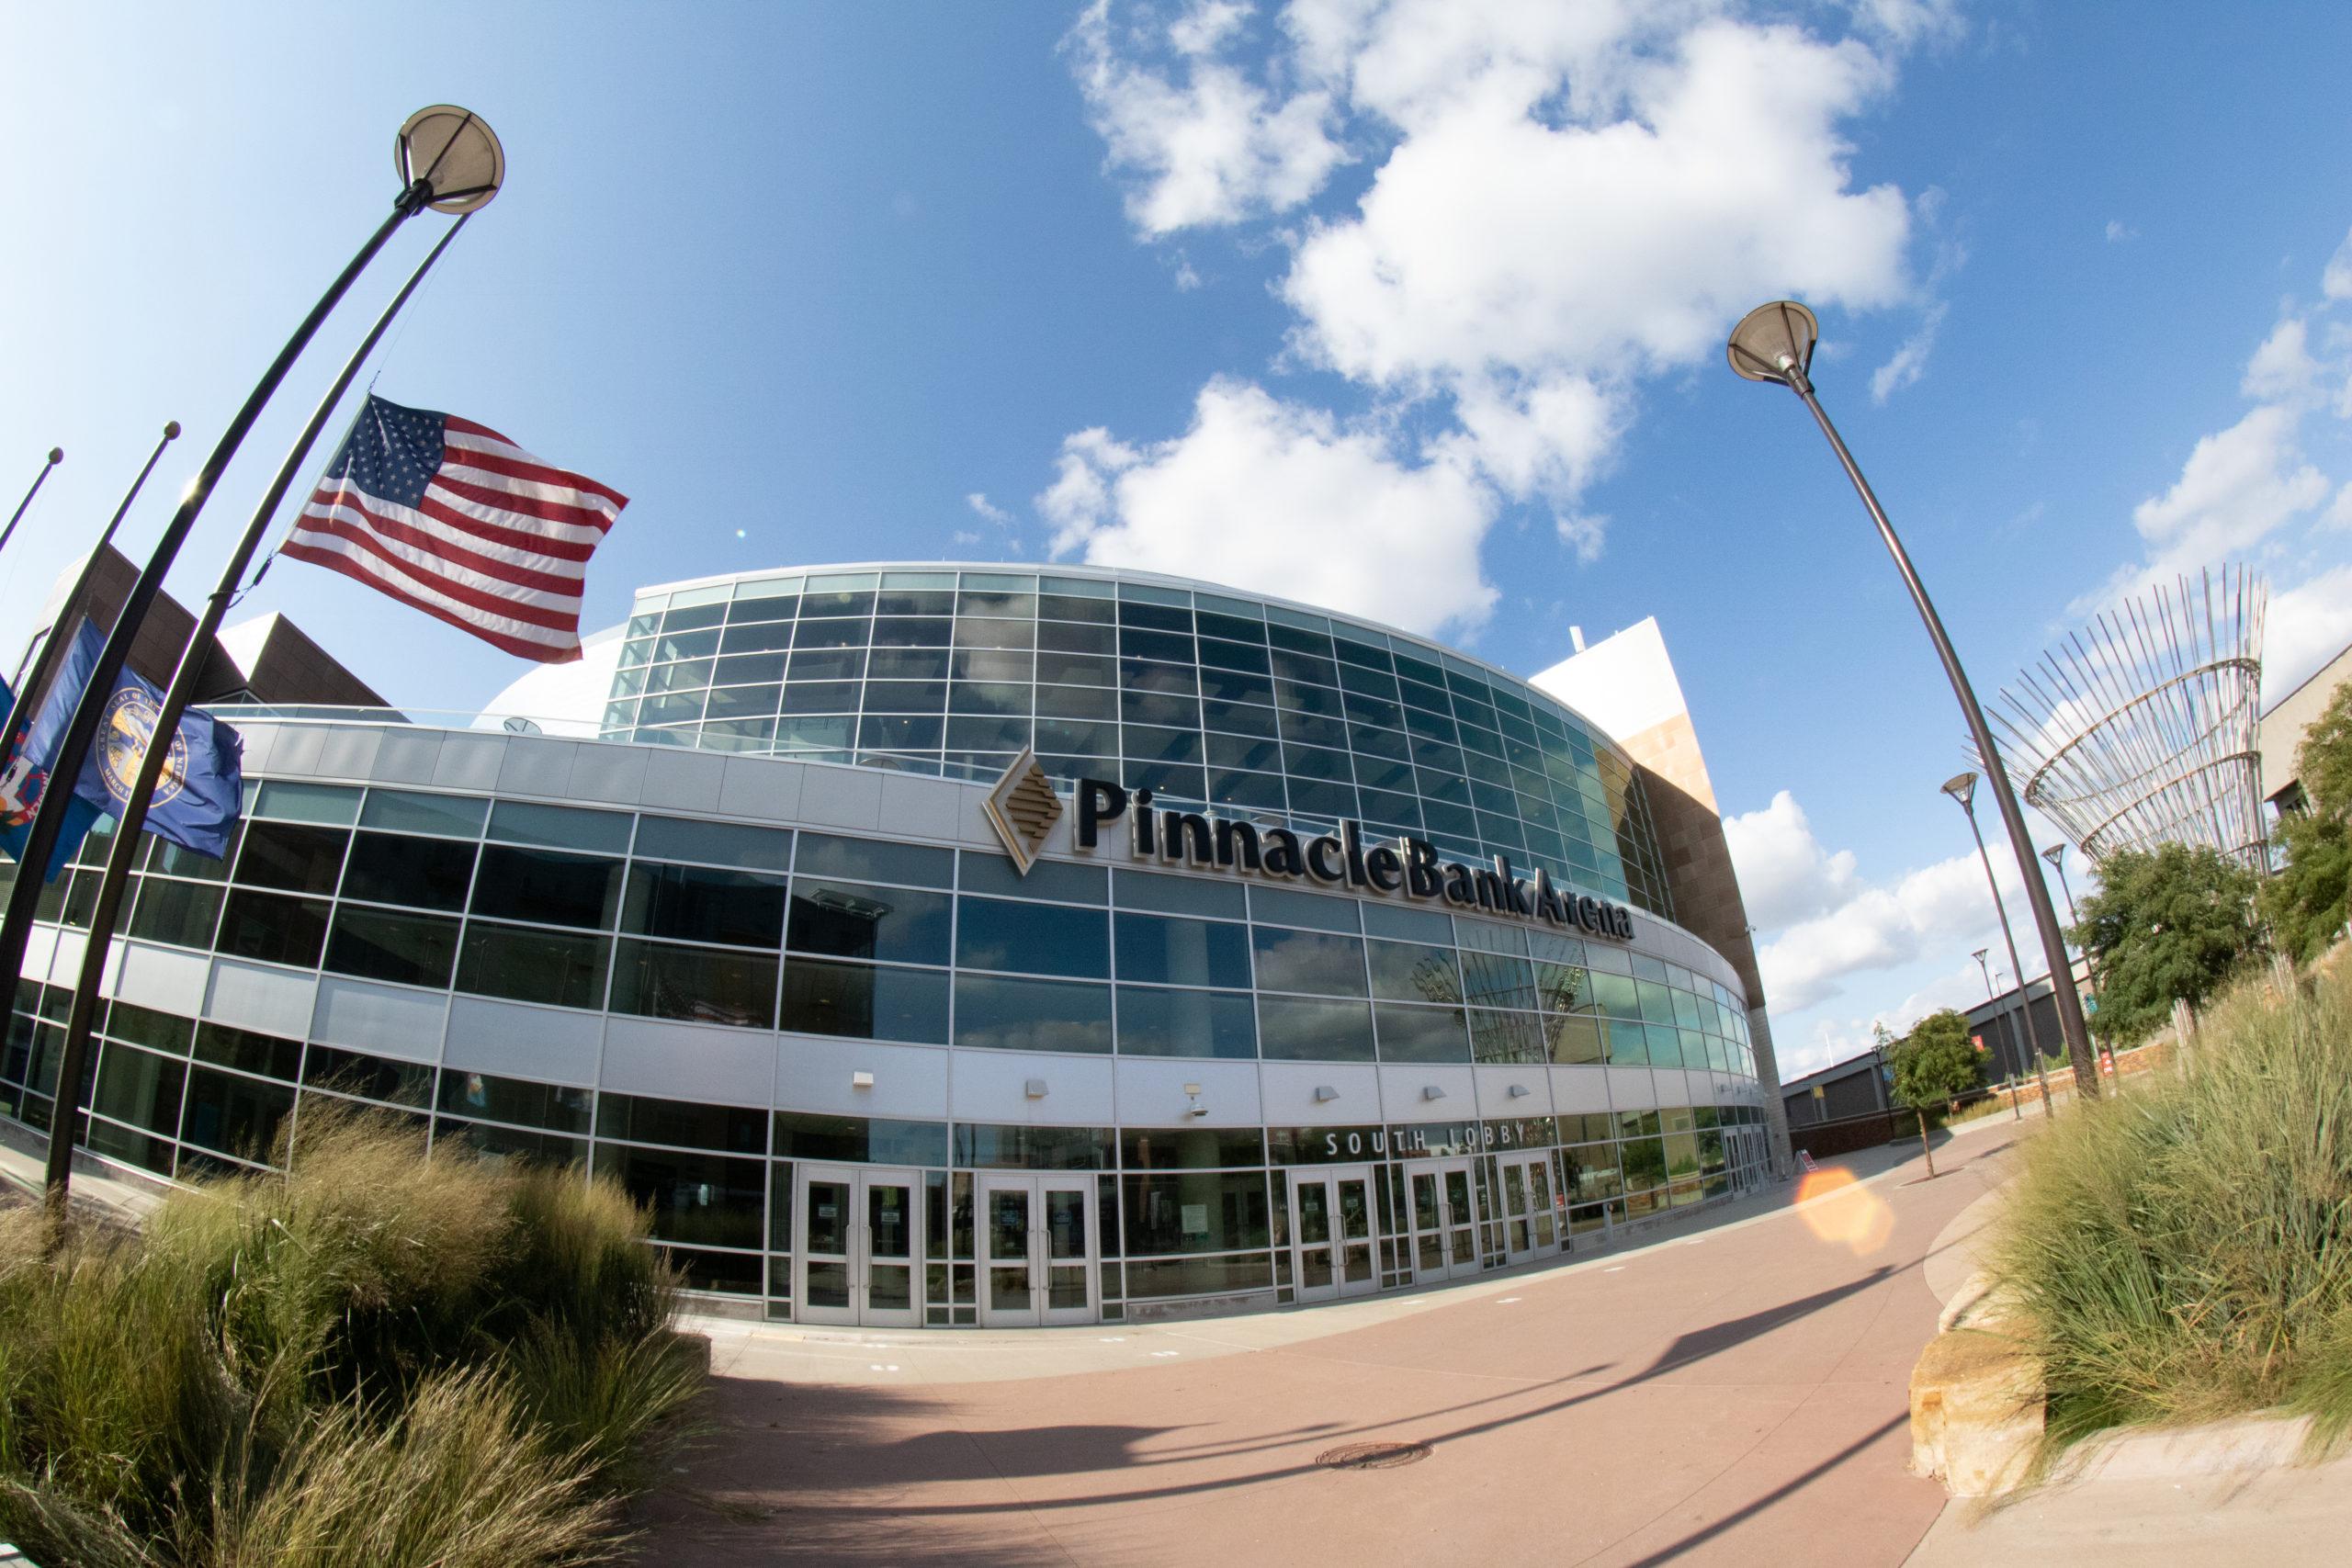 The Pinnacle Bank Arena in 2020. Photo by Aaron Housenga